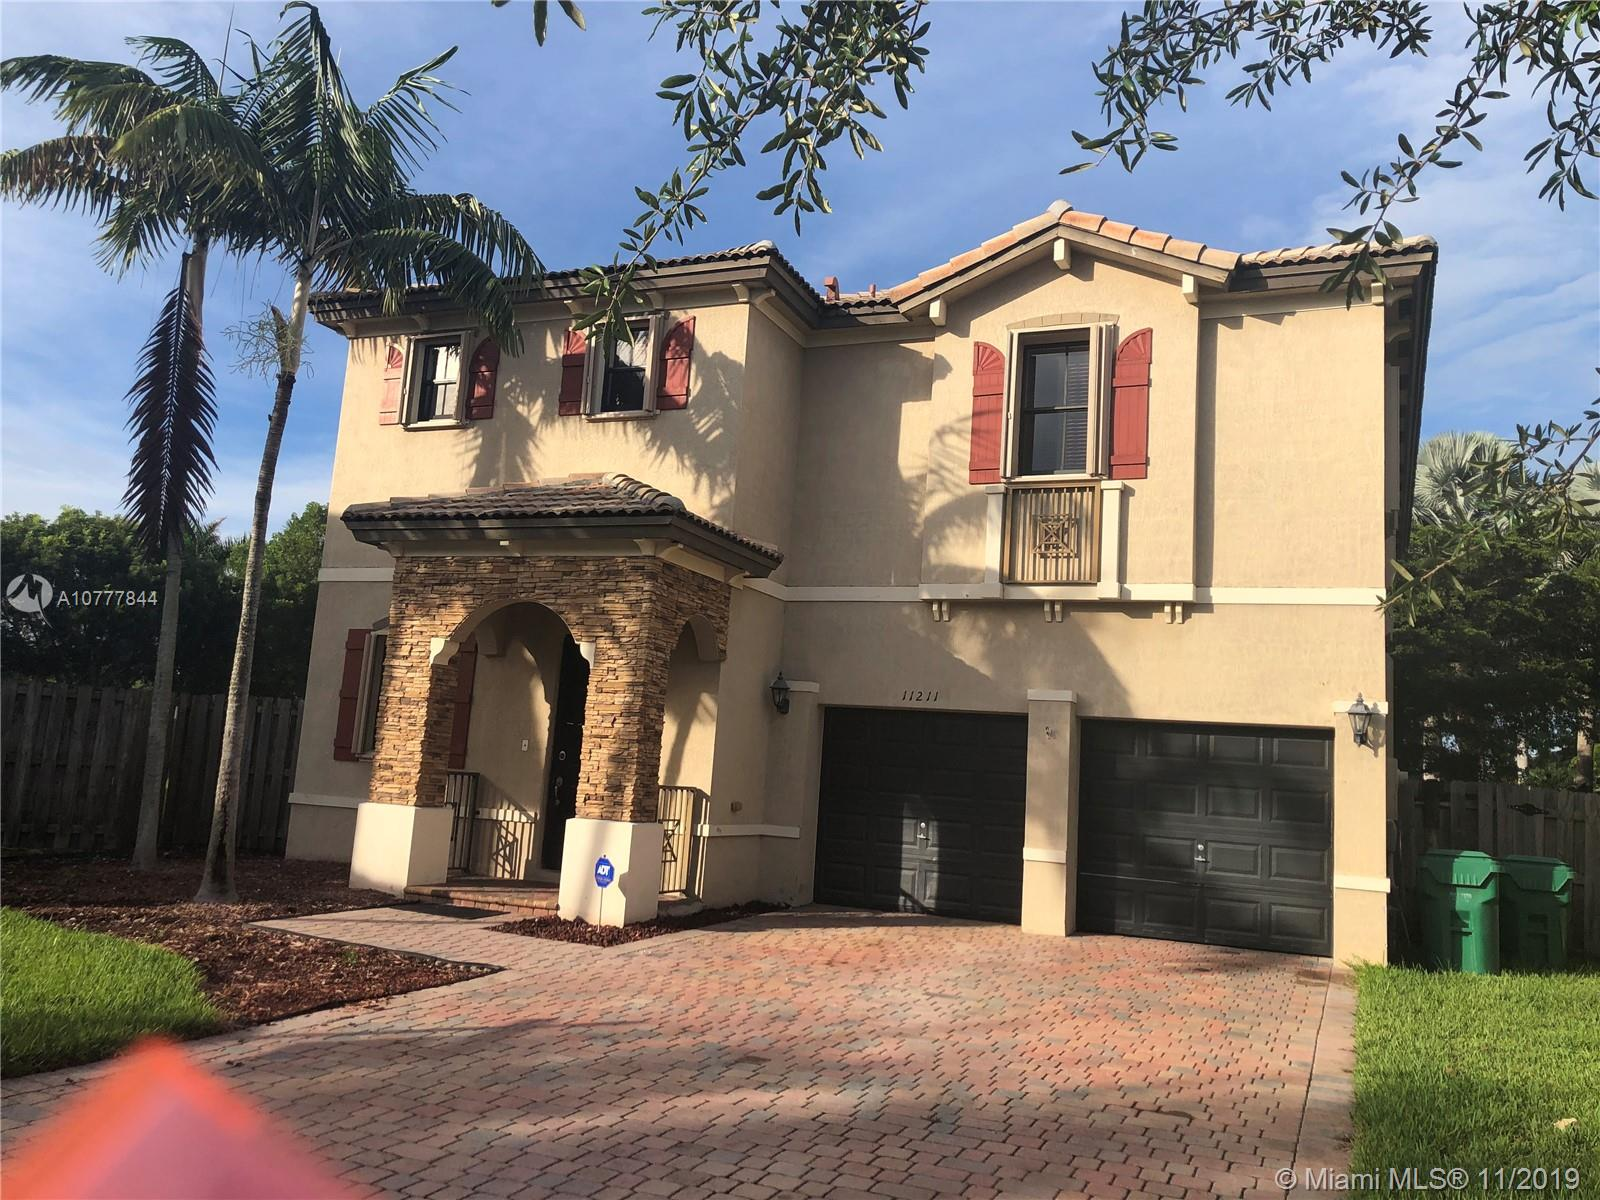 11211 SW 240th Ln #11211, Homestead, FL 33032 - Homestead, FL real estate listing